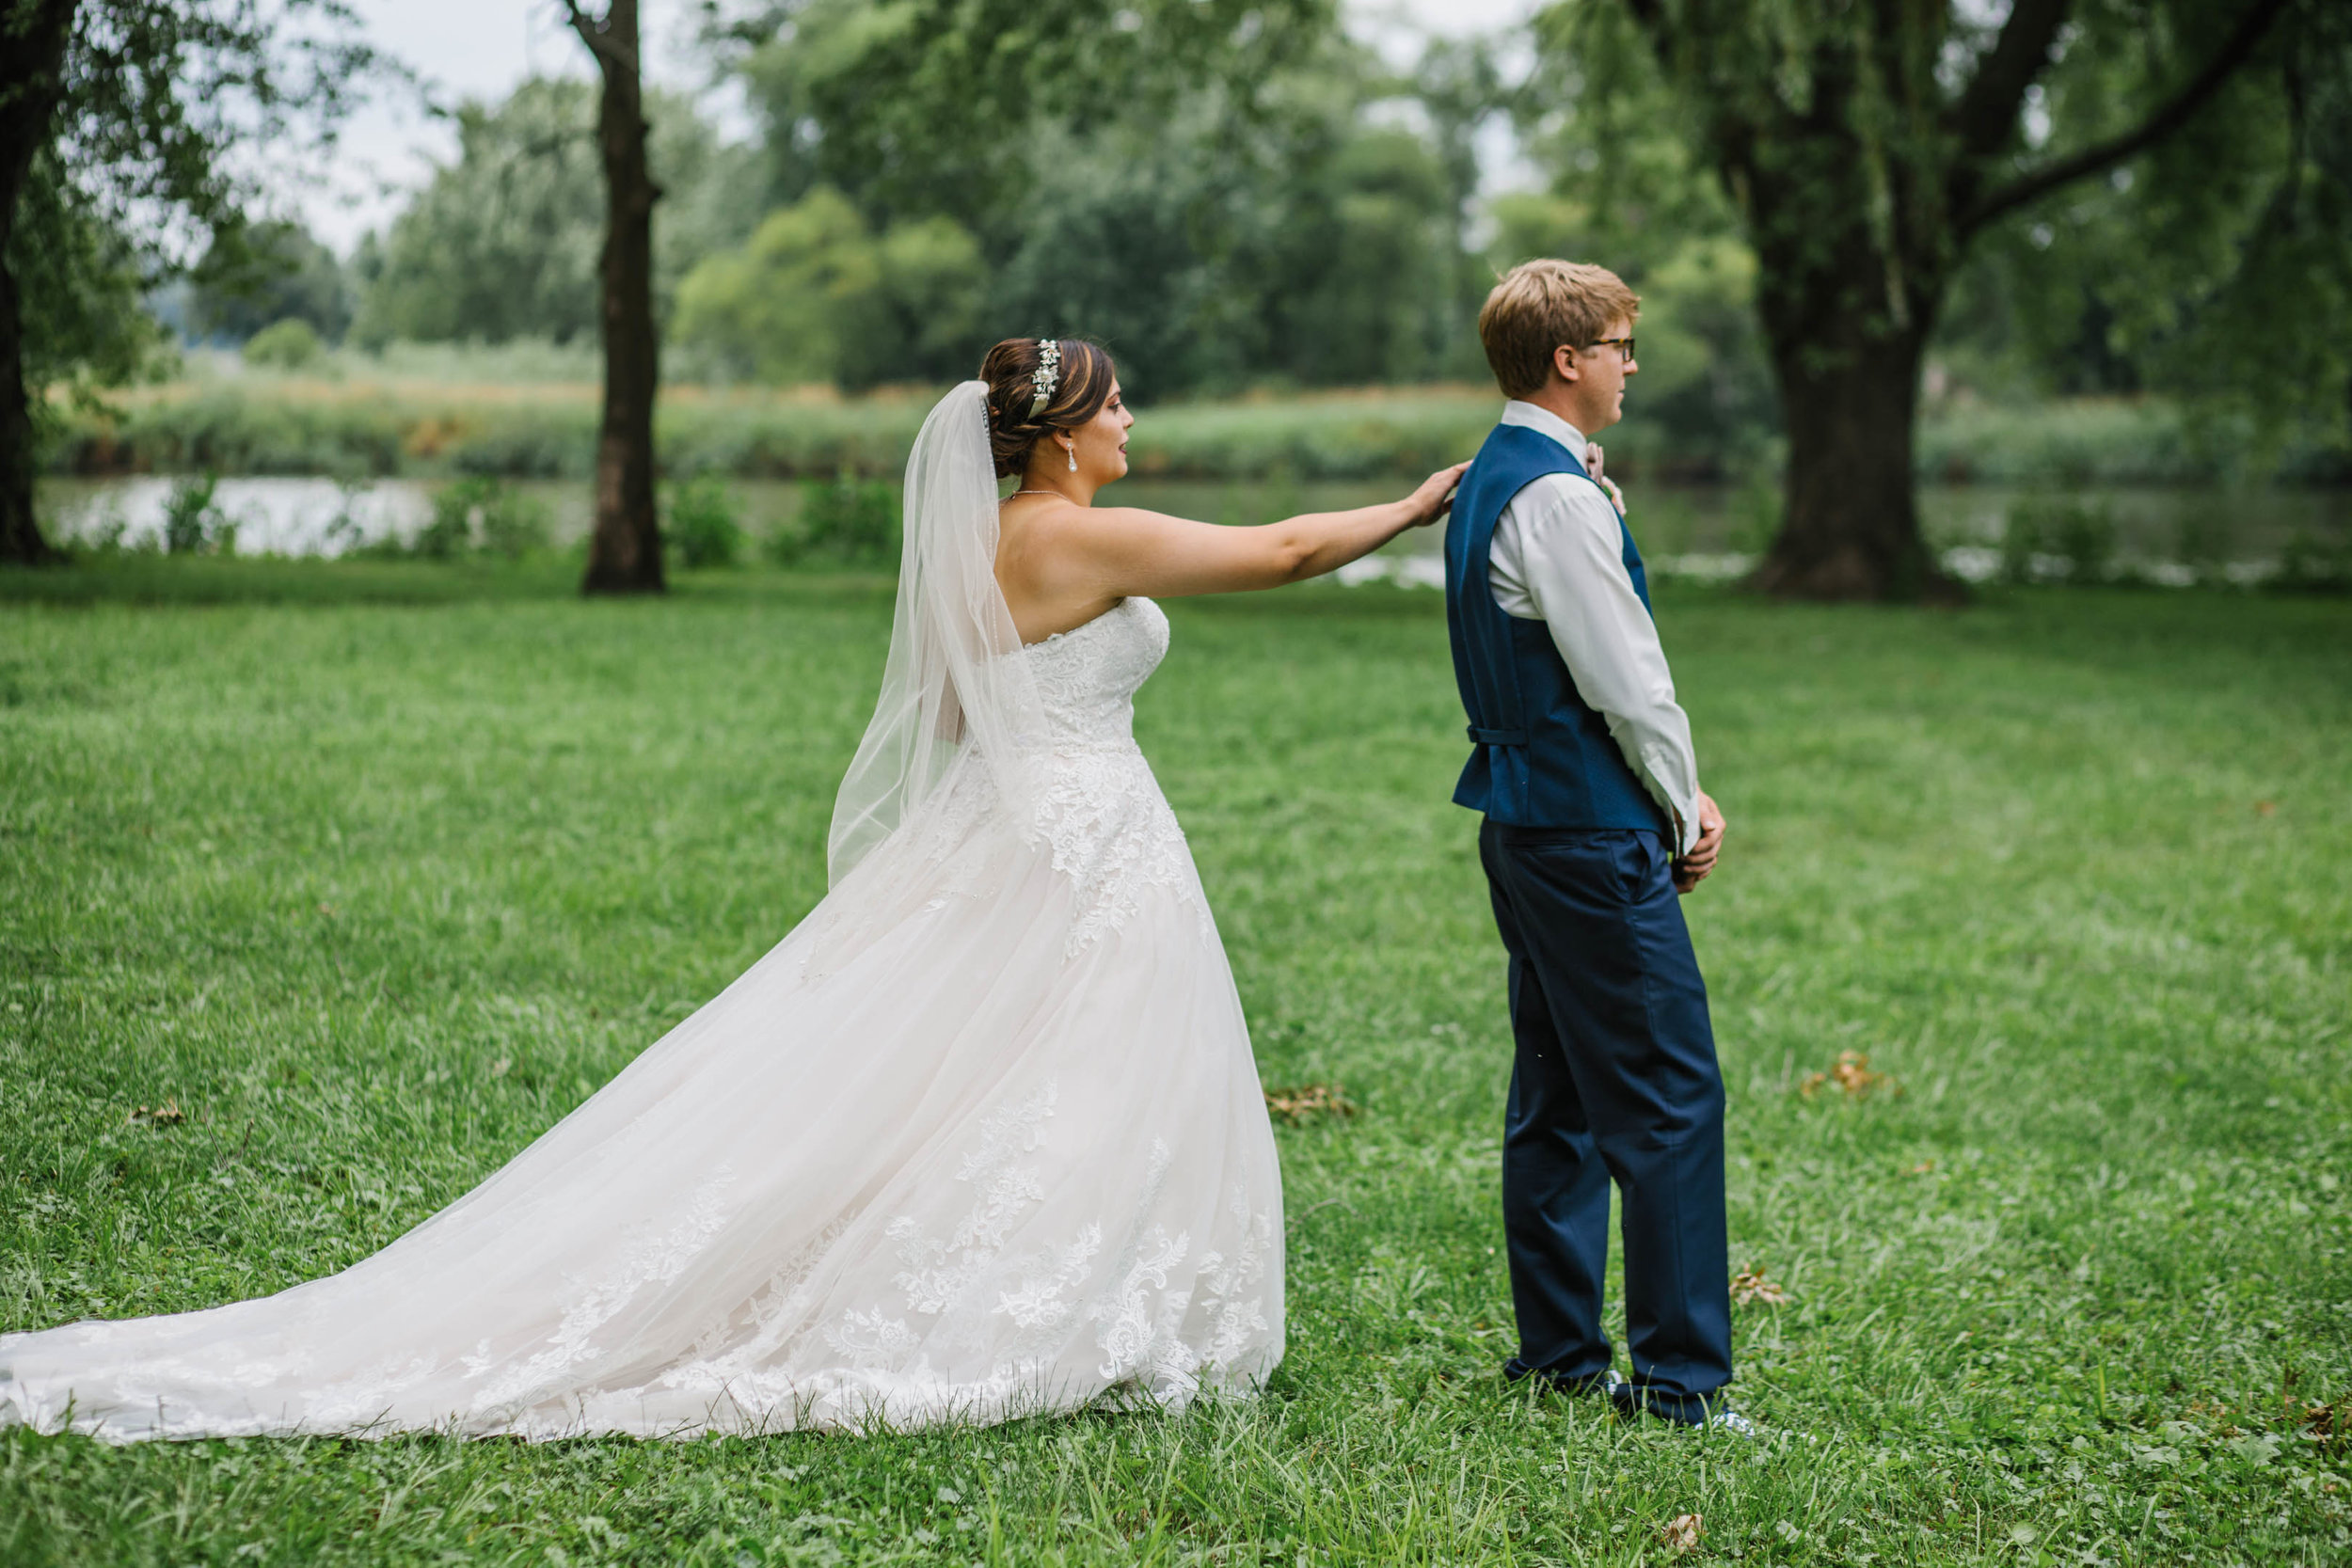 waverly_iowa_wedding_photographer-43.jpg